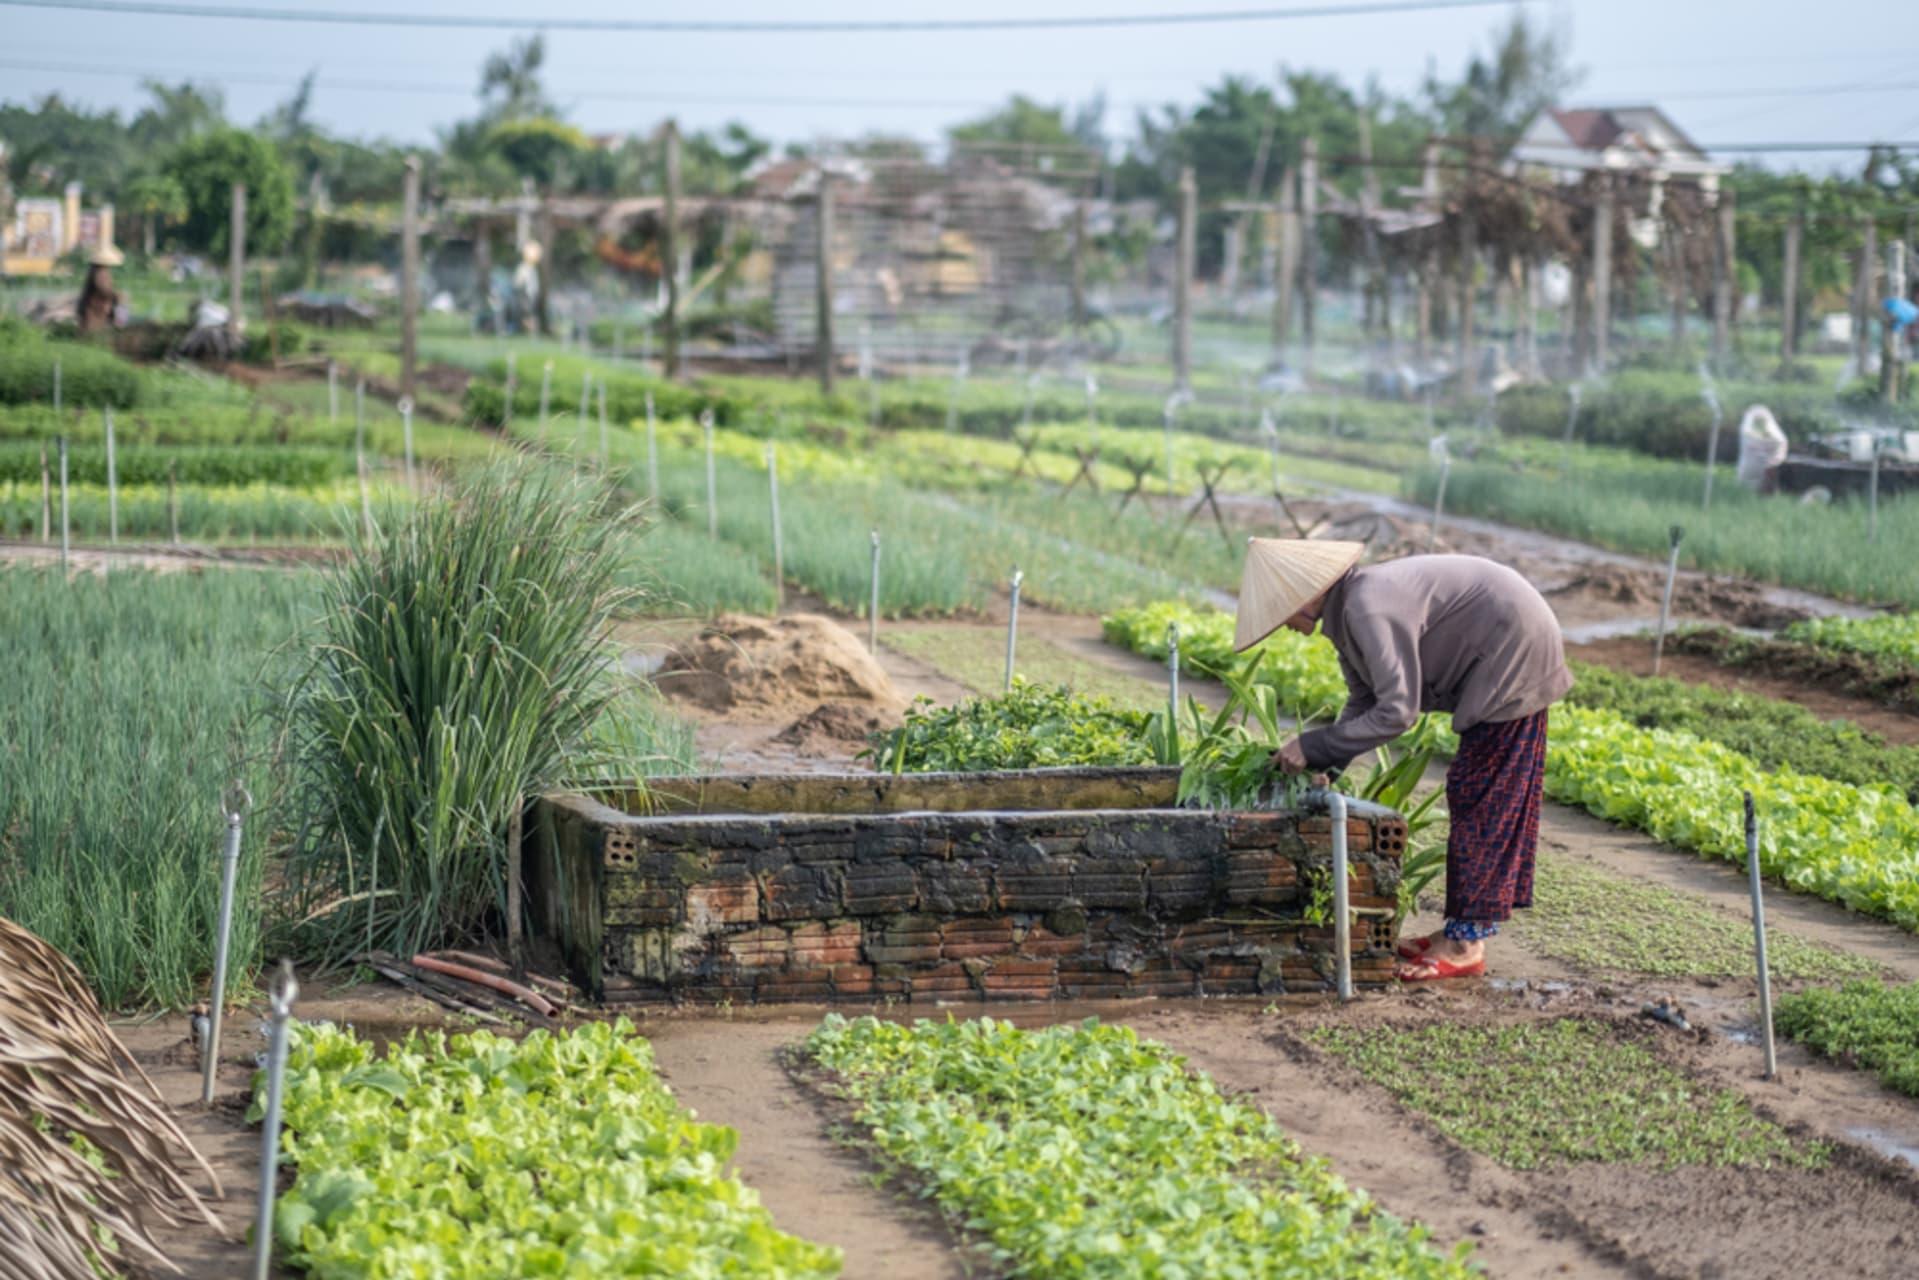 Hội An - Hội An - Day 2: Herb & Vegetable Village